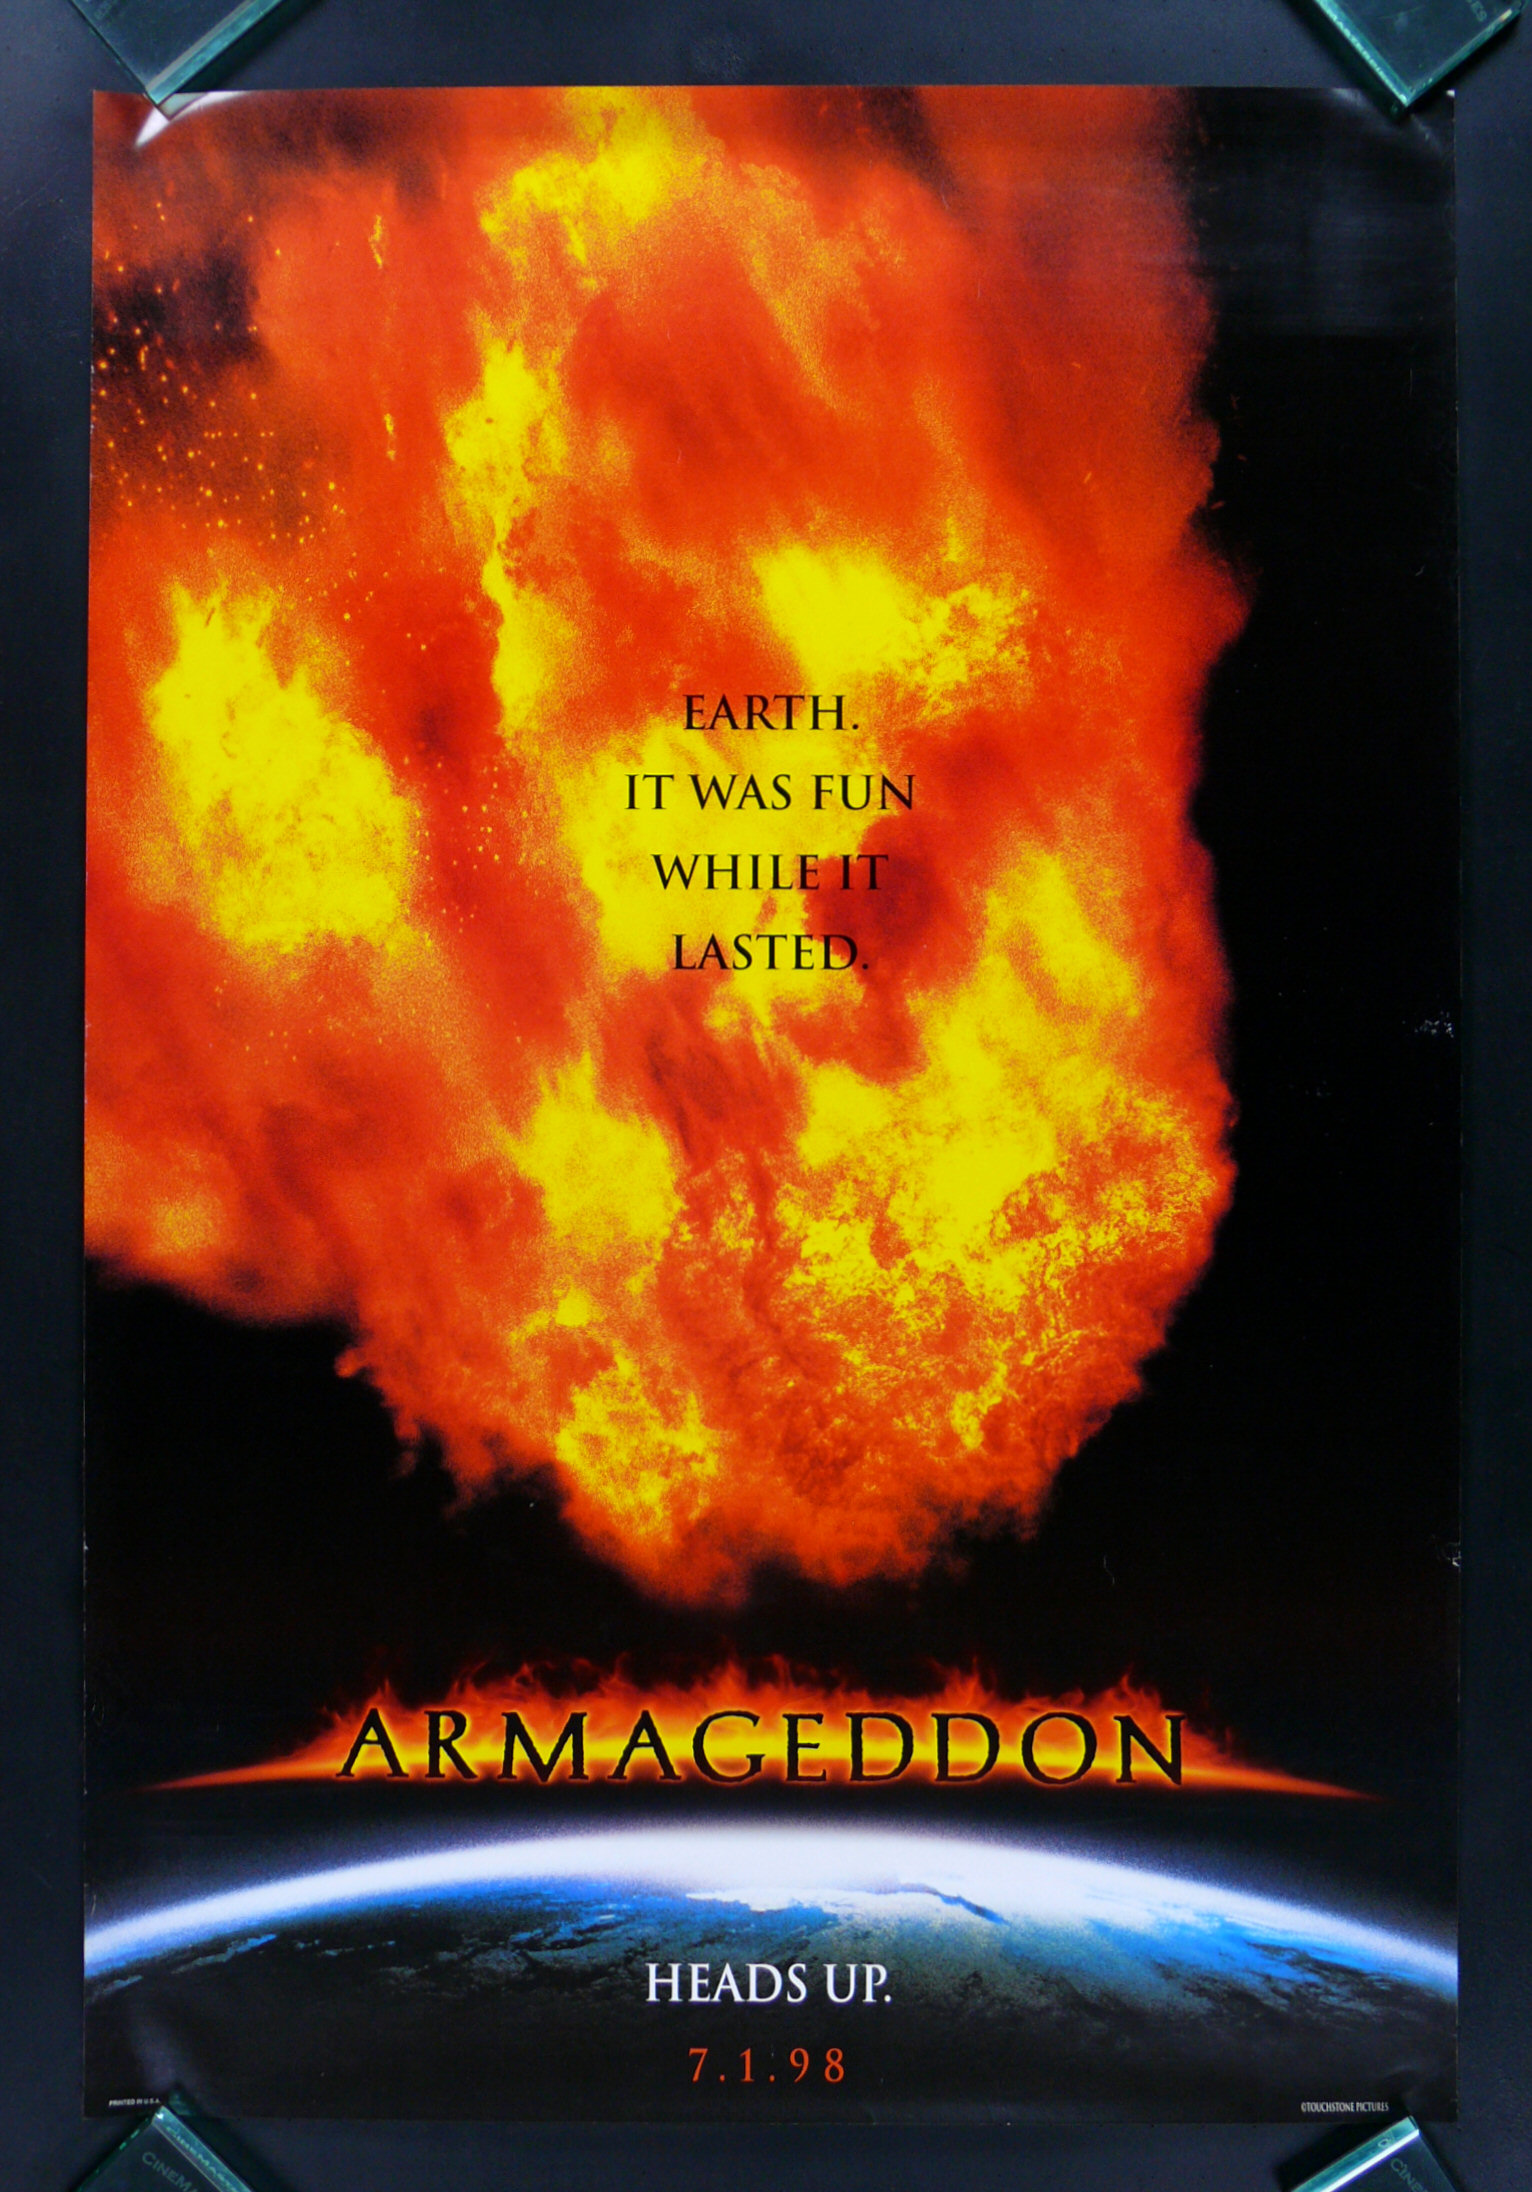 ARMAGEDDON * ORIGINAL ADV TEASER DS MOVIE POSTER 1998 | eBay